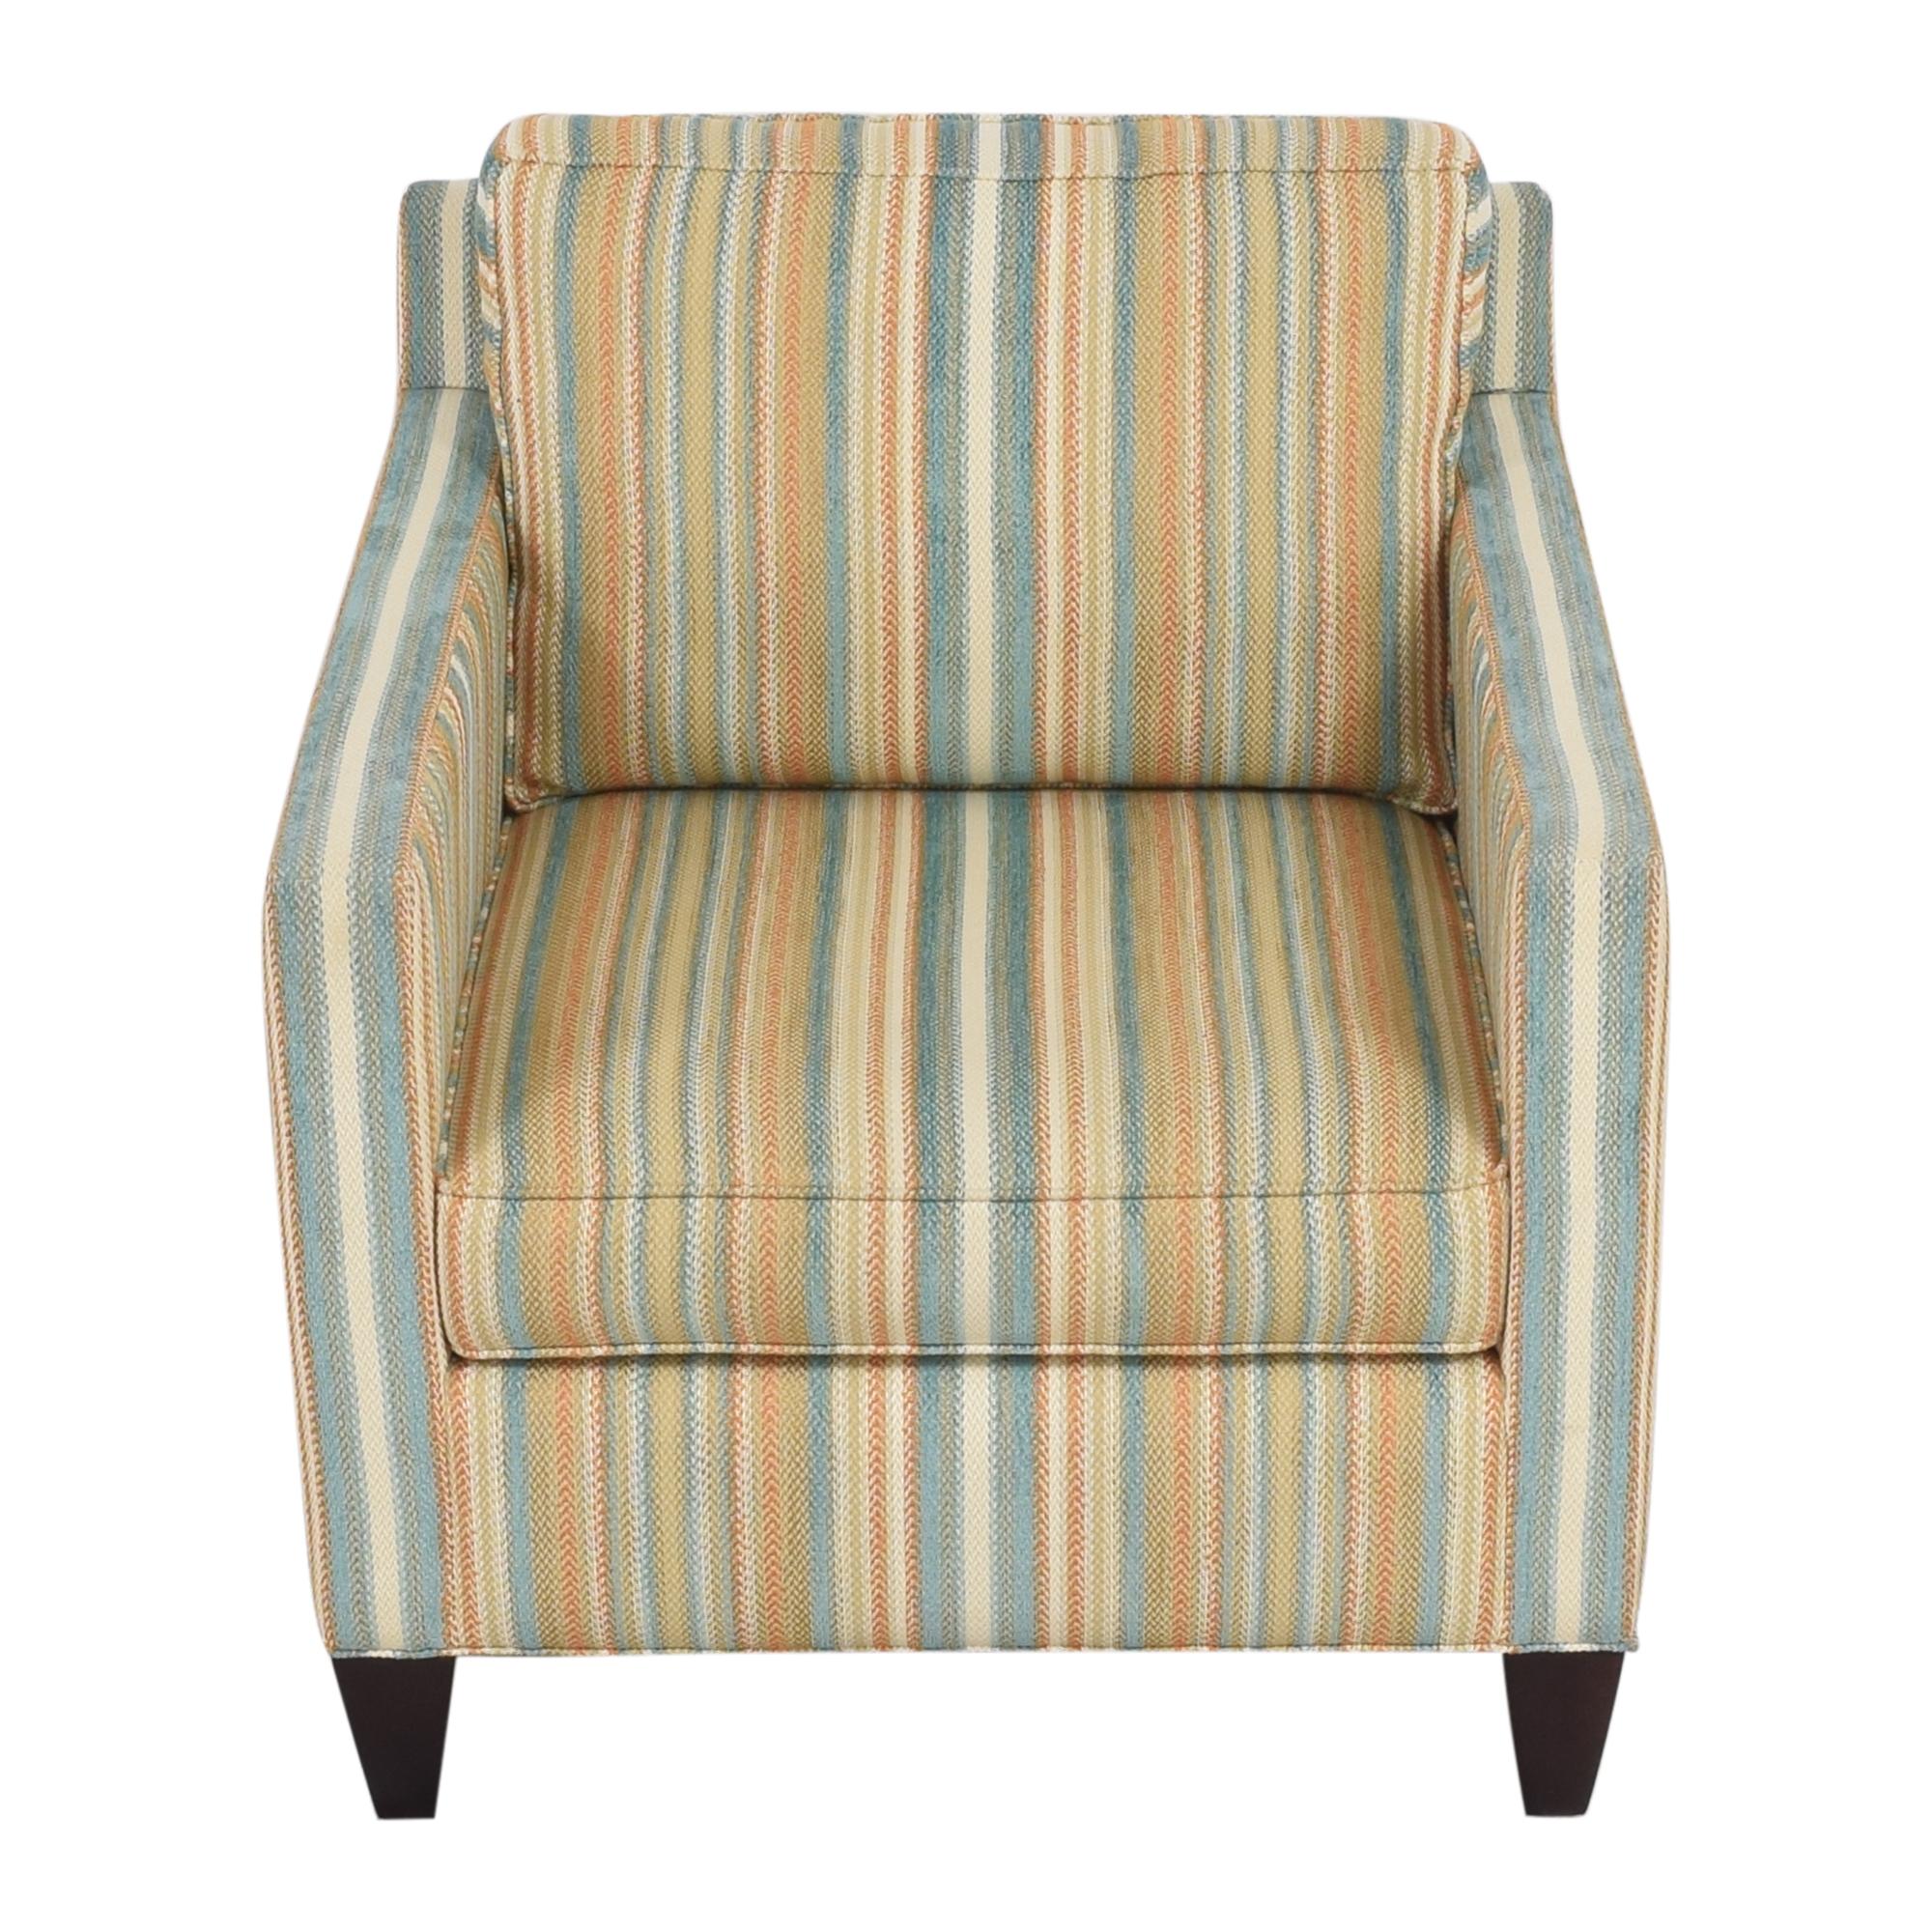 shop Thomasville Striped Accent Chair Thomasville